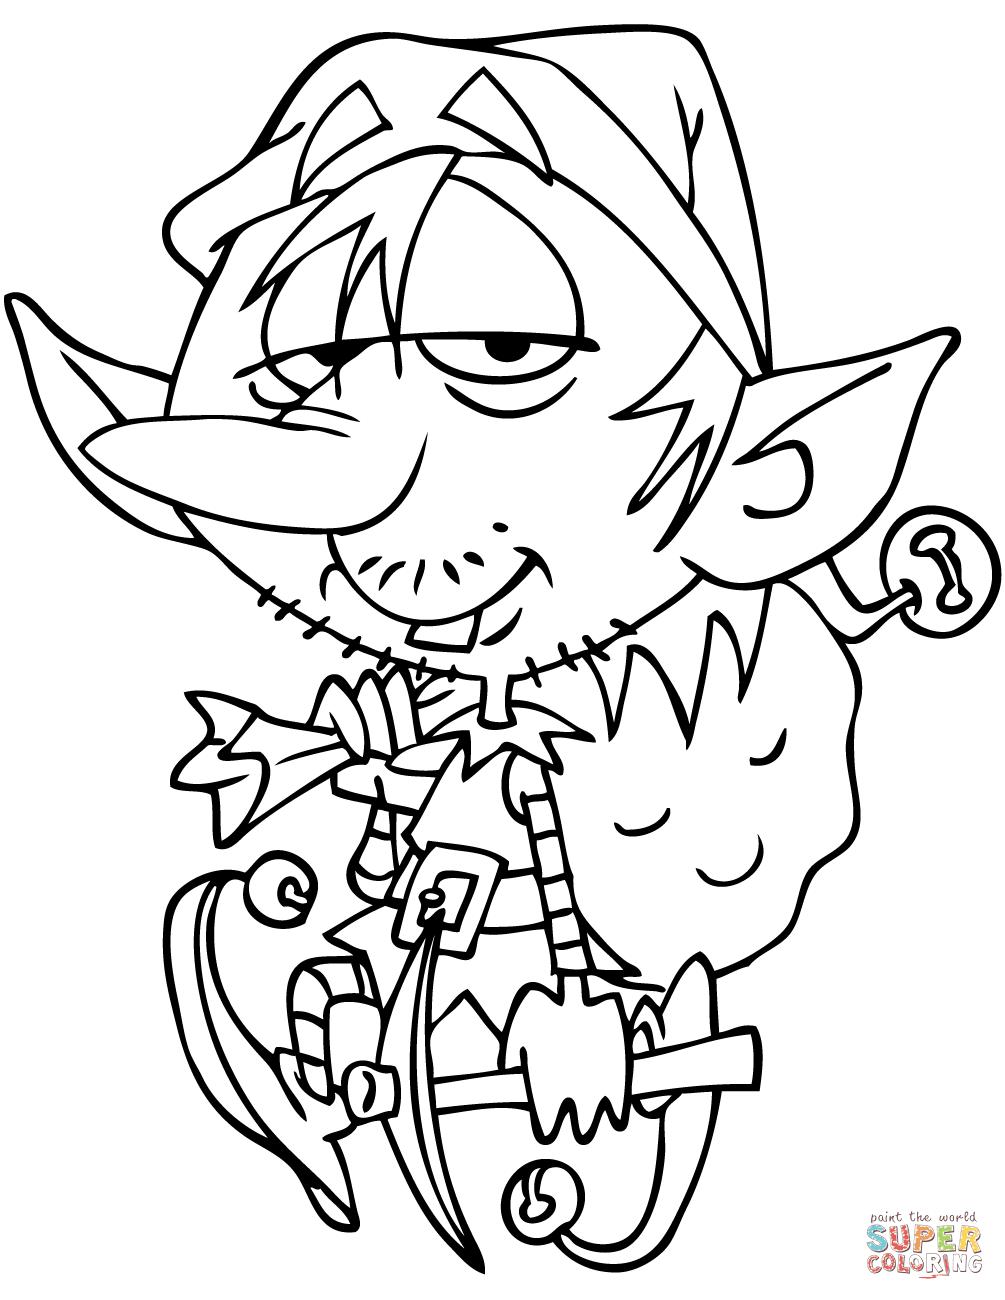 Cartoon Elf Carrying Santa Bag Coloring Page Free Printable